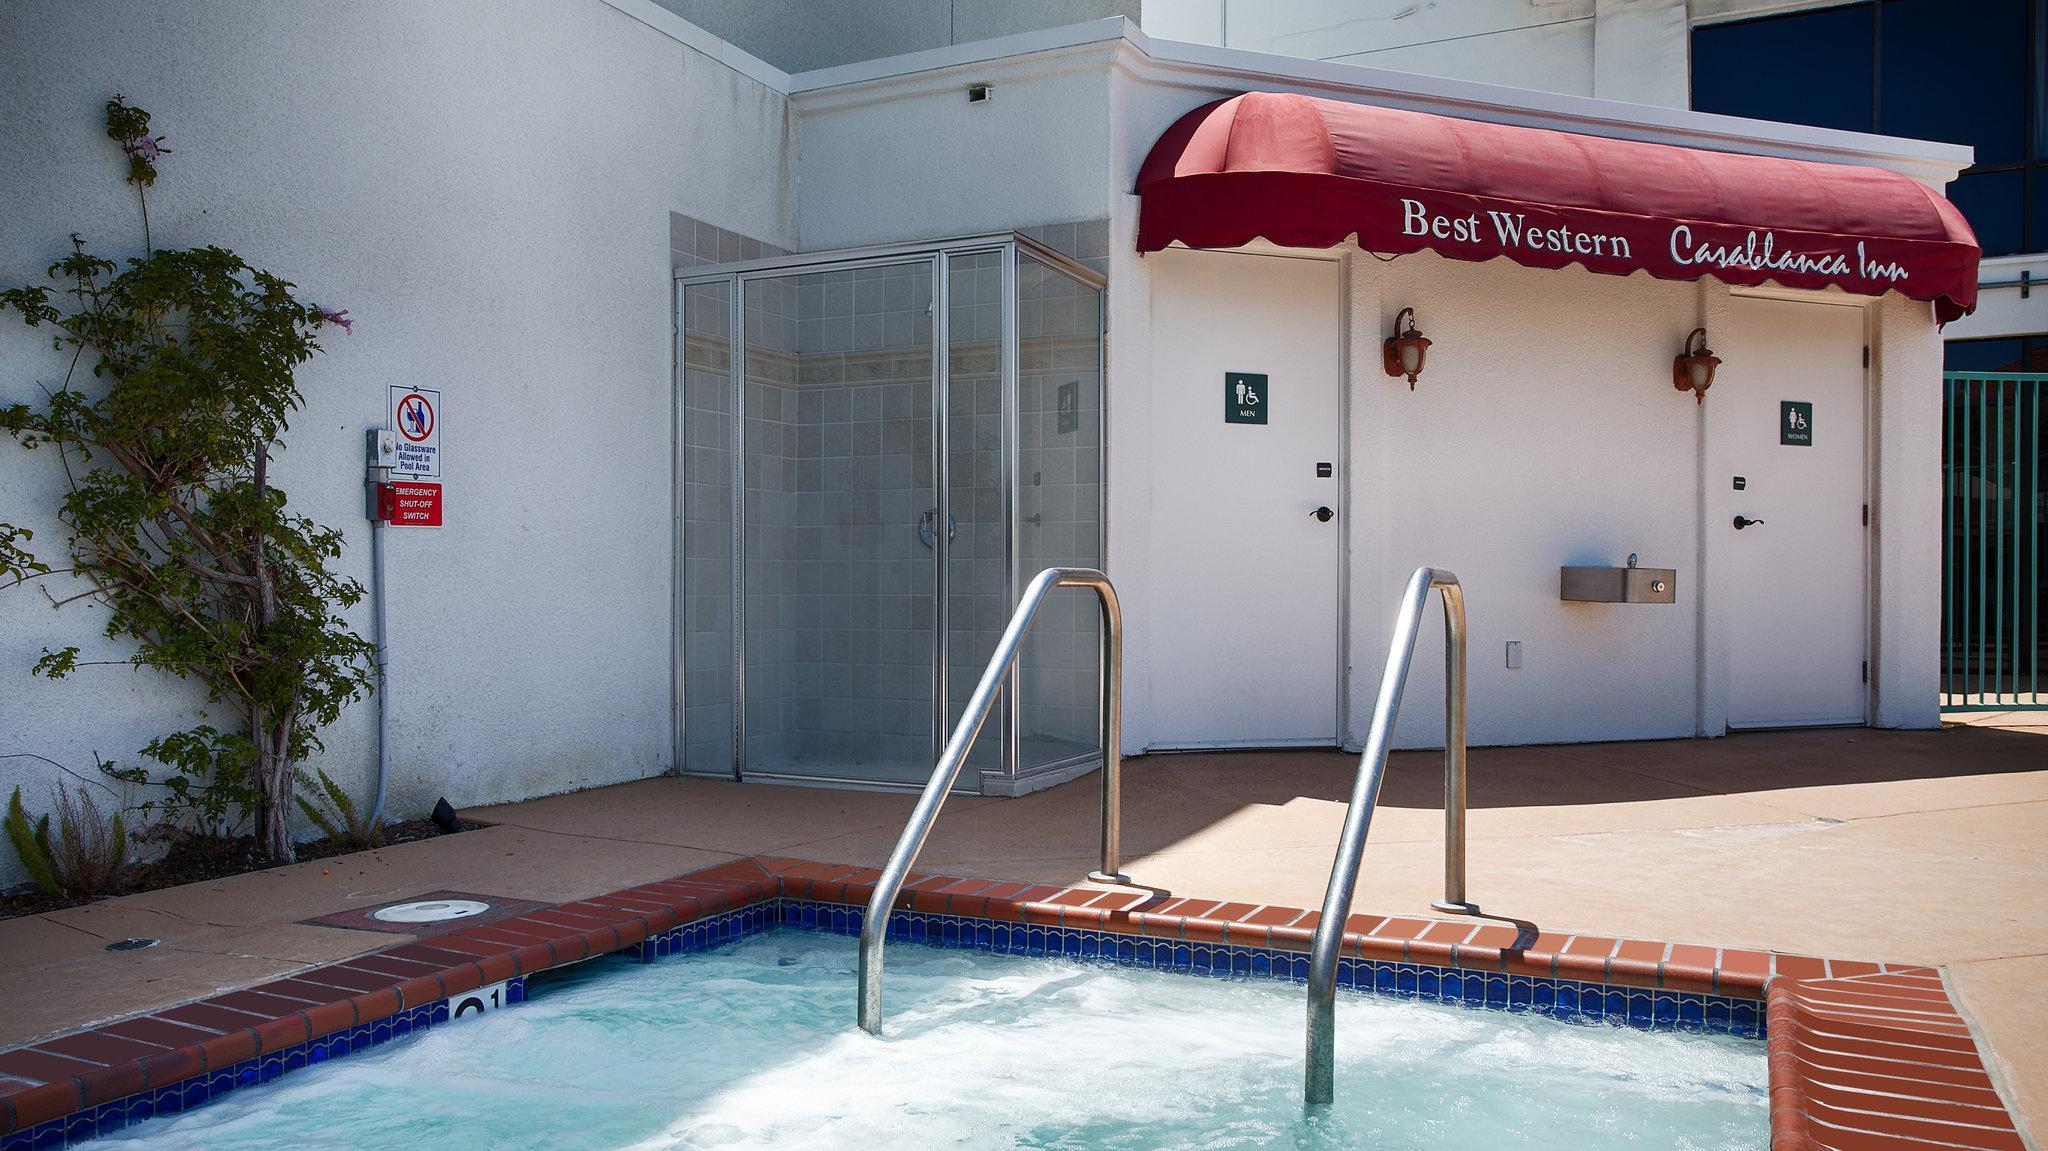 BEST WESTERN PLUS Casablanca Inn